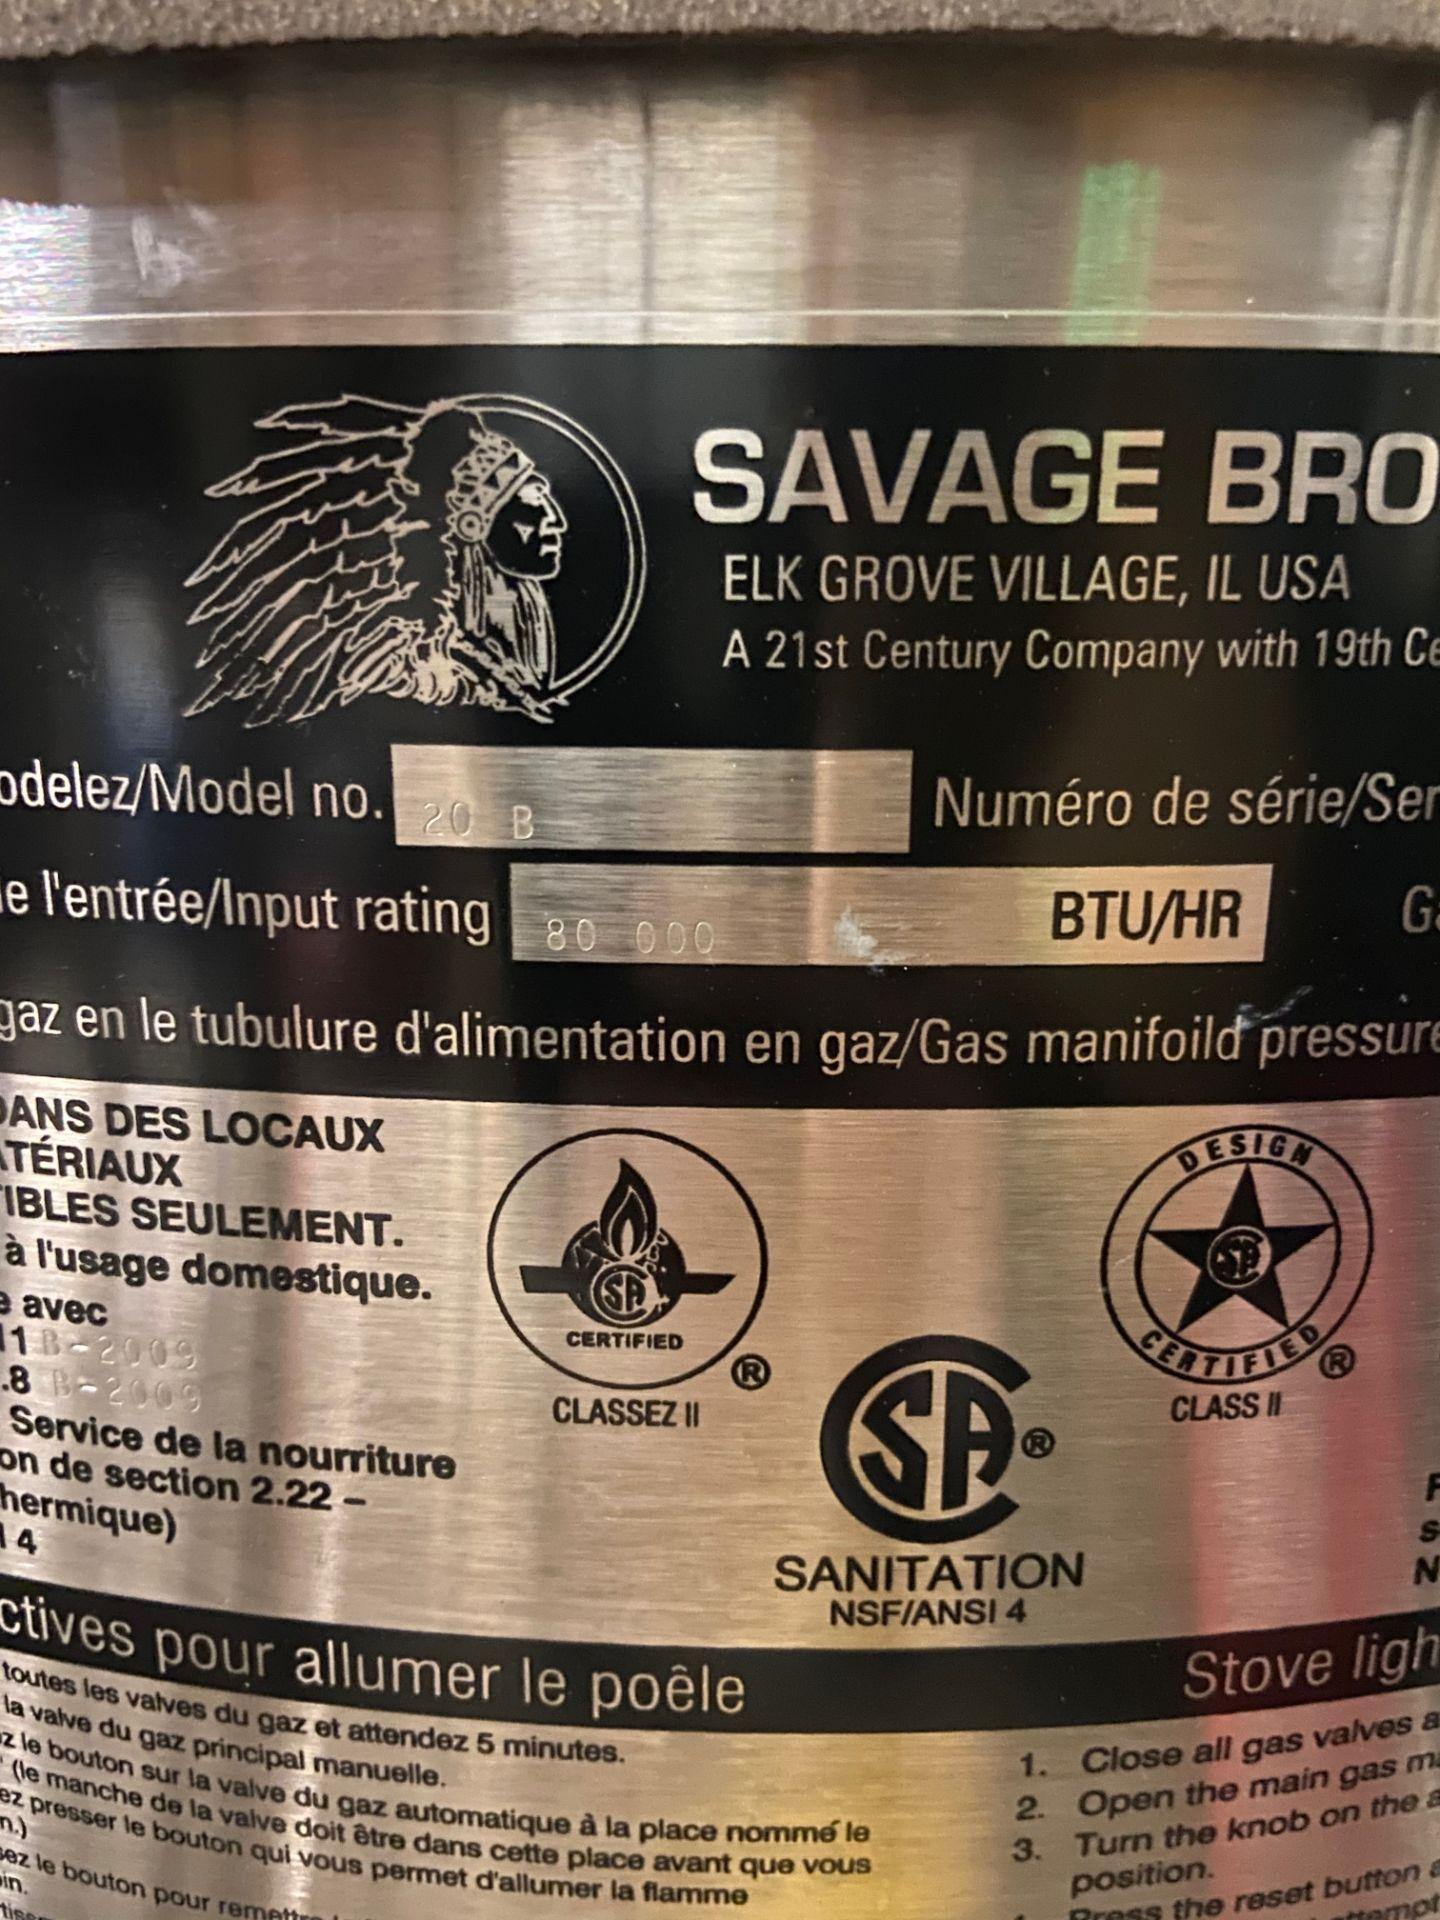 NEW Savage Bros Gas Candy Stove, Model# 20B, Serial# 024376, 80,000 BTU/HR - Image 2 of 6